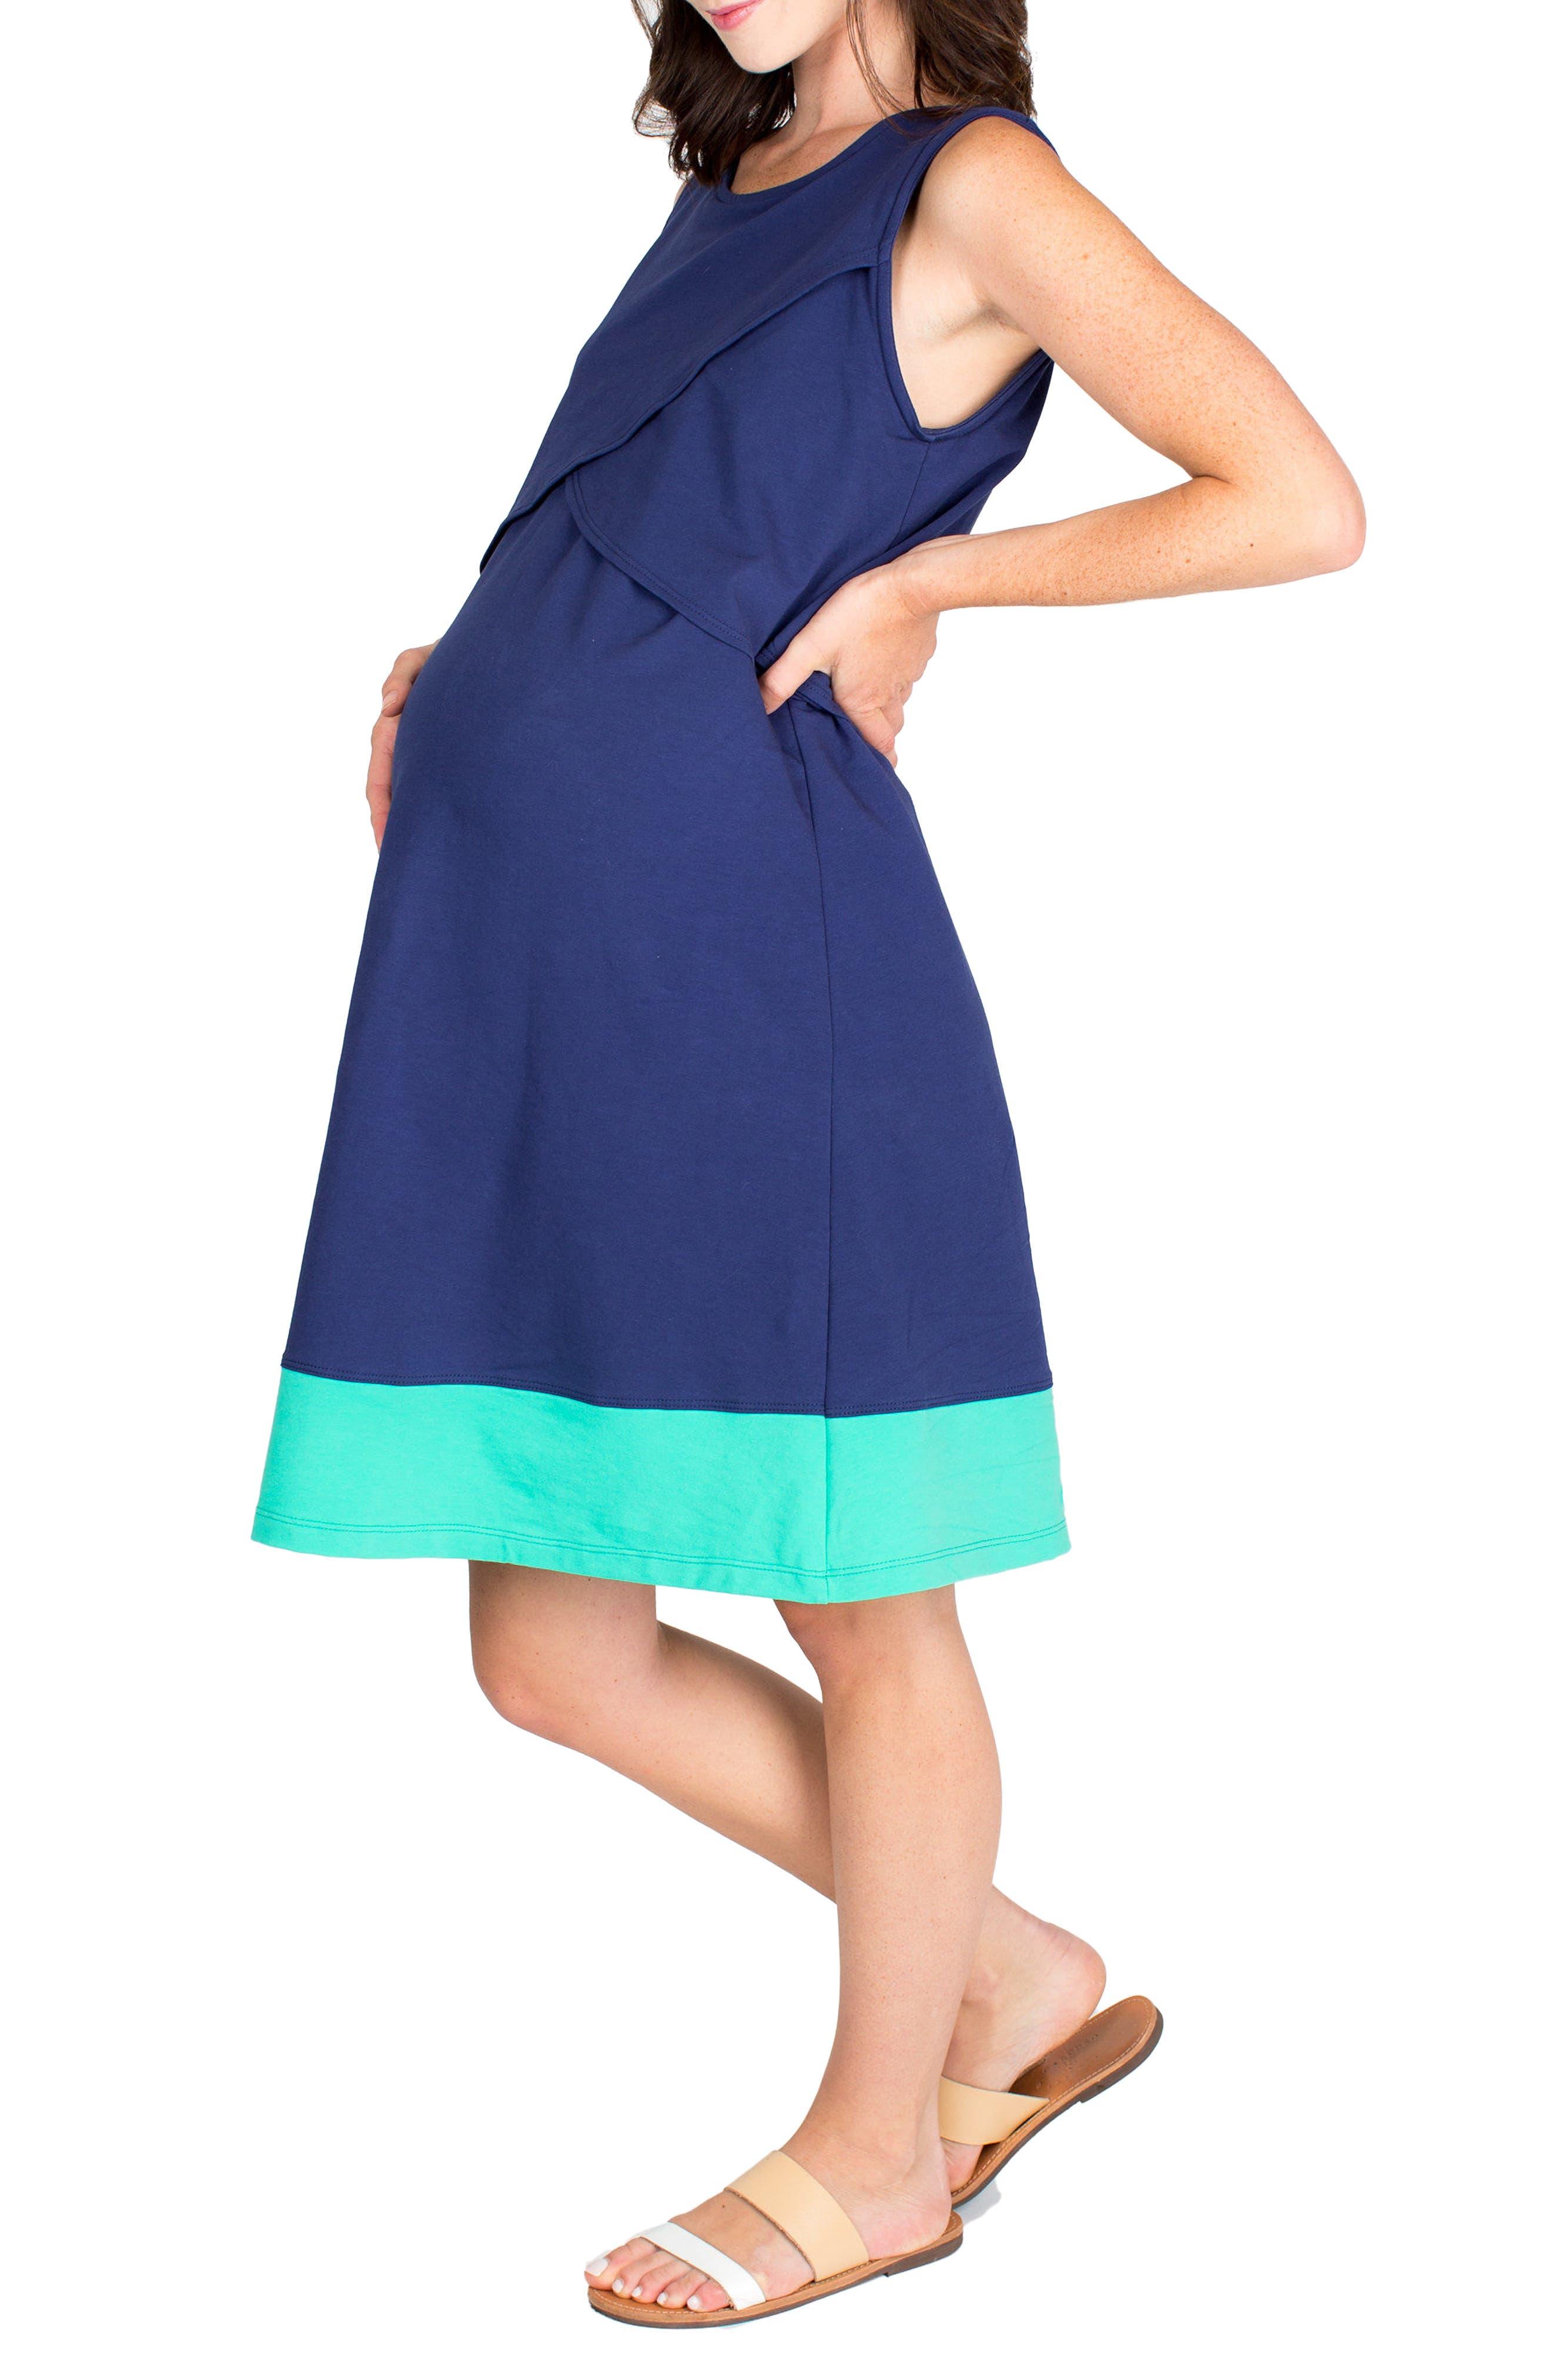 Alternate Image 3  - Nom Maternity Sophia Maternity/Nursing Dress